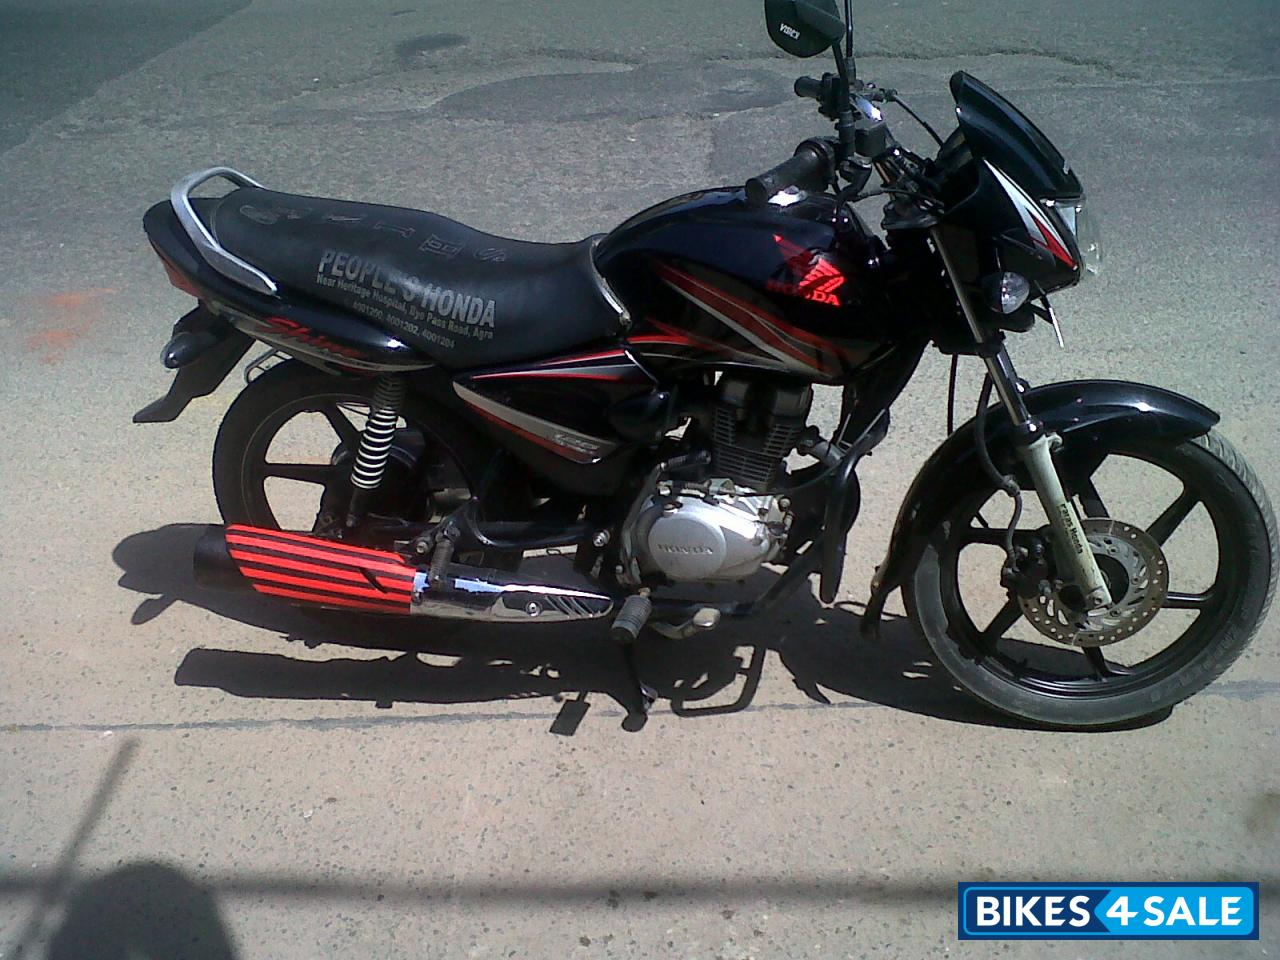 Black Honda Shine Picture 1 Album Id Is 89791 Bike